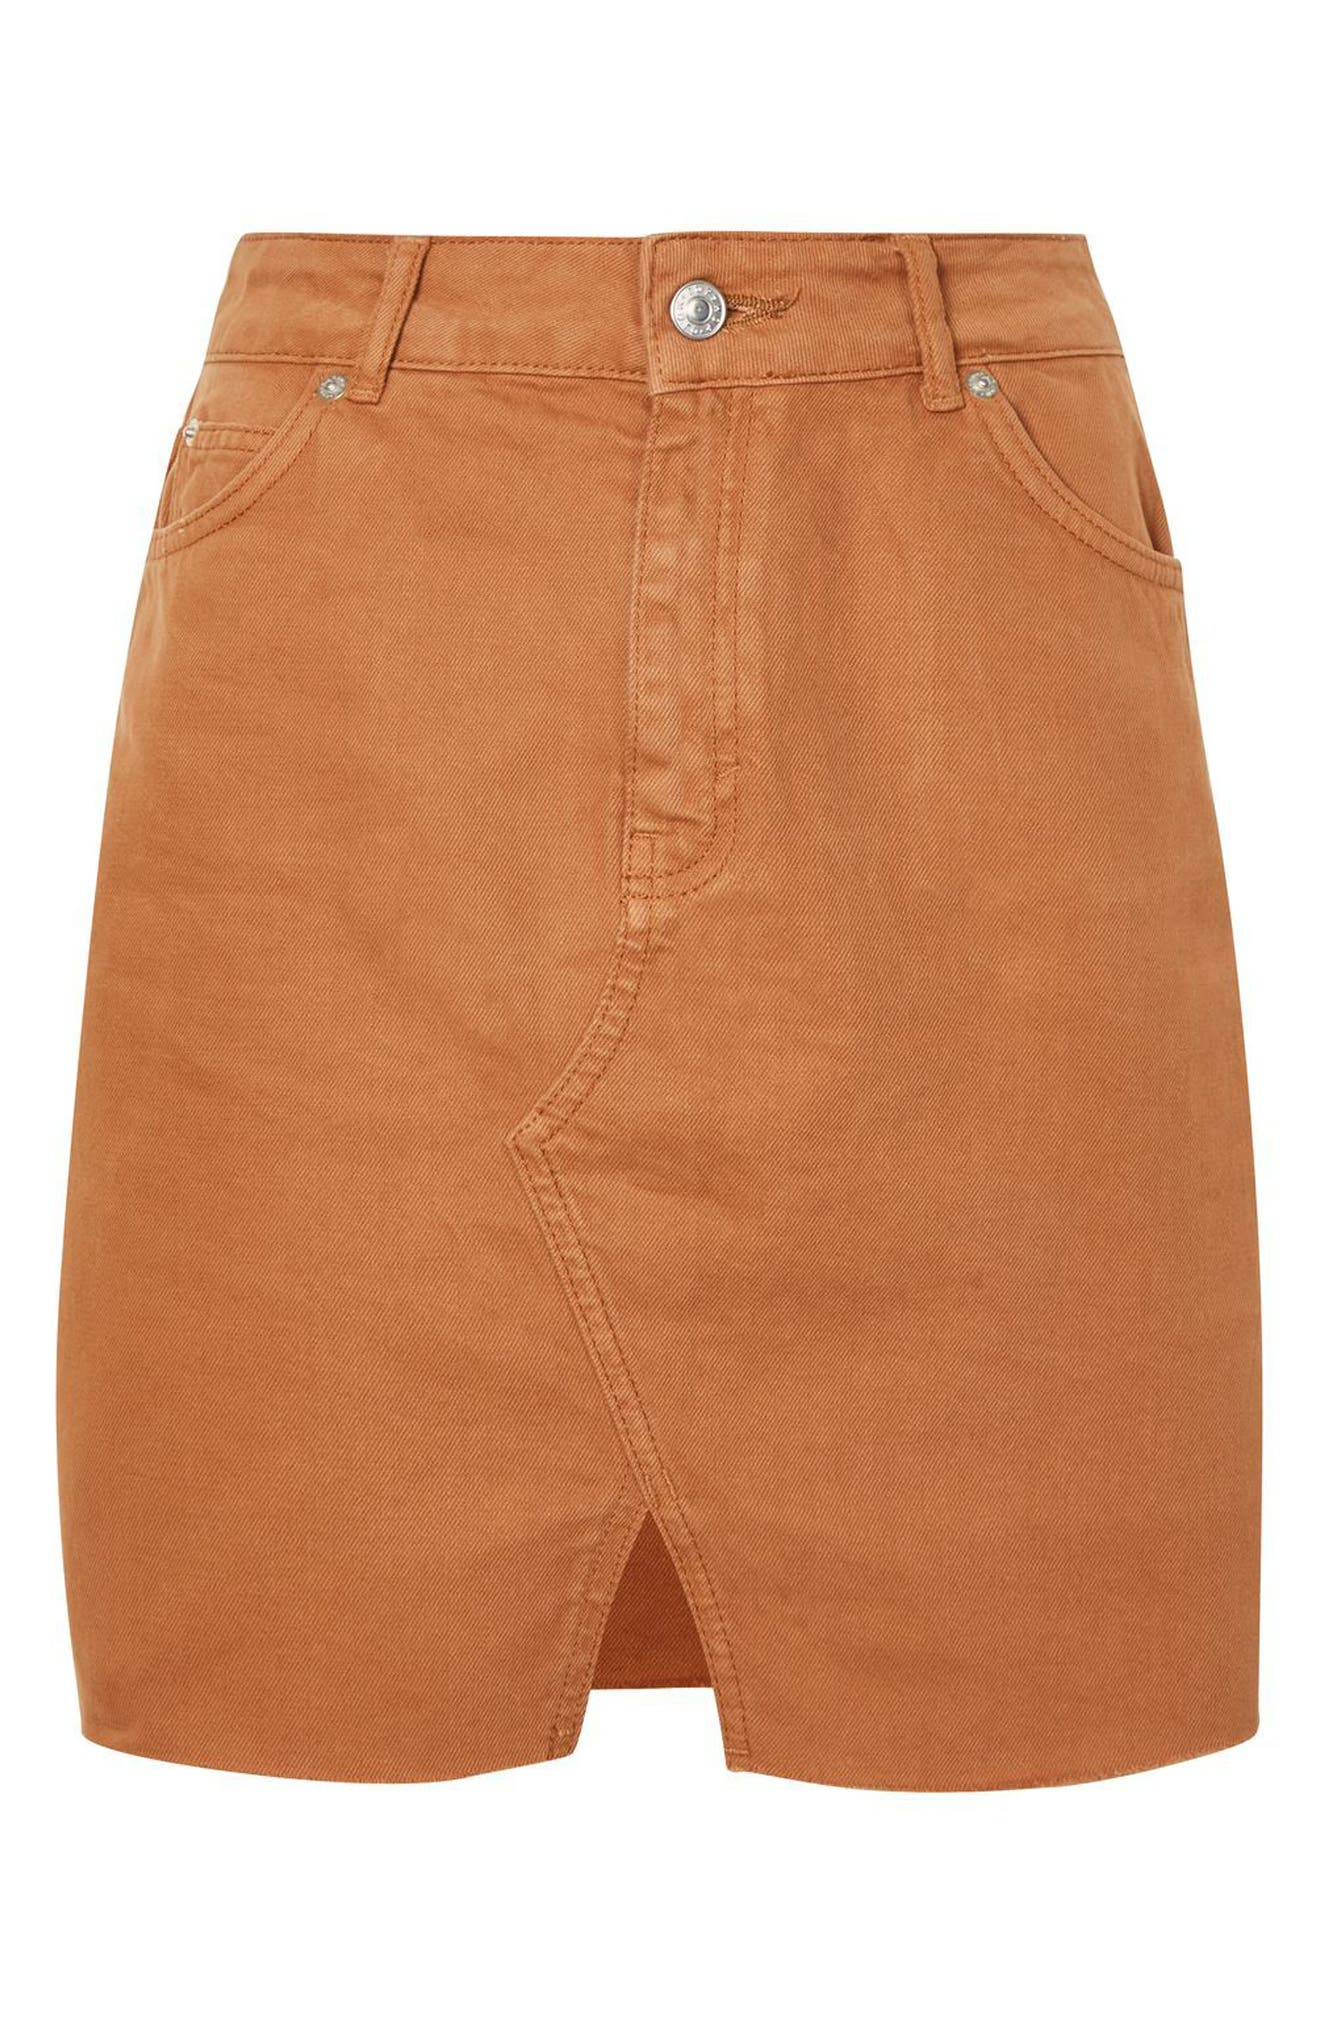 Mini Denim Skirt,                             Alternate thumbnail 4, color,                             Rust